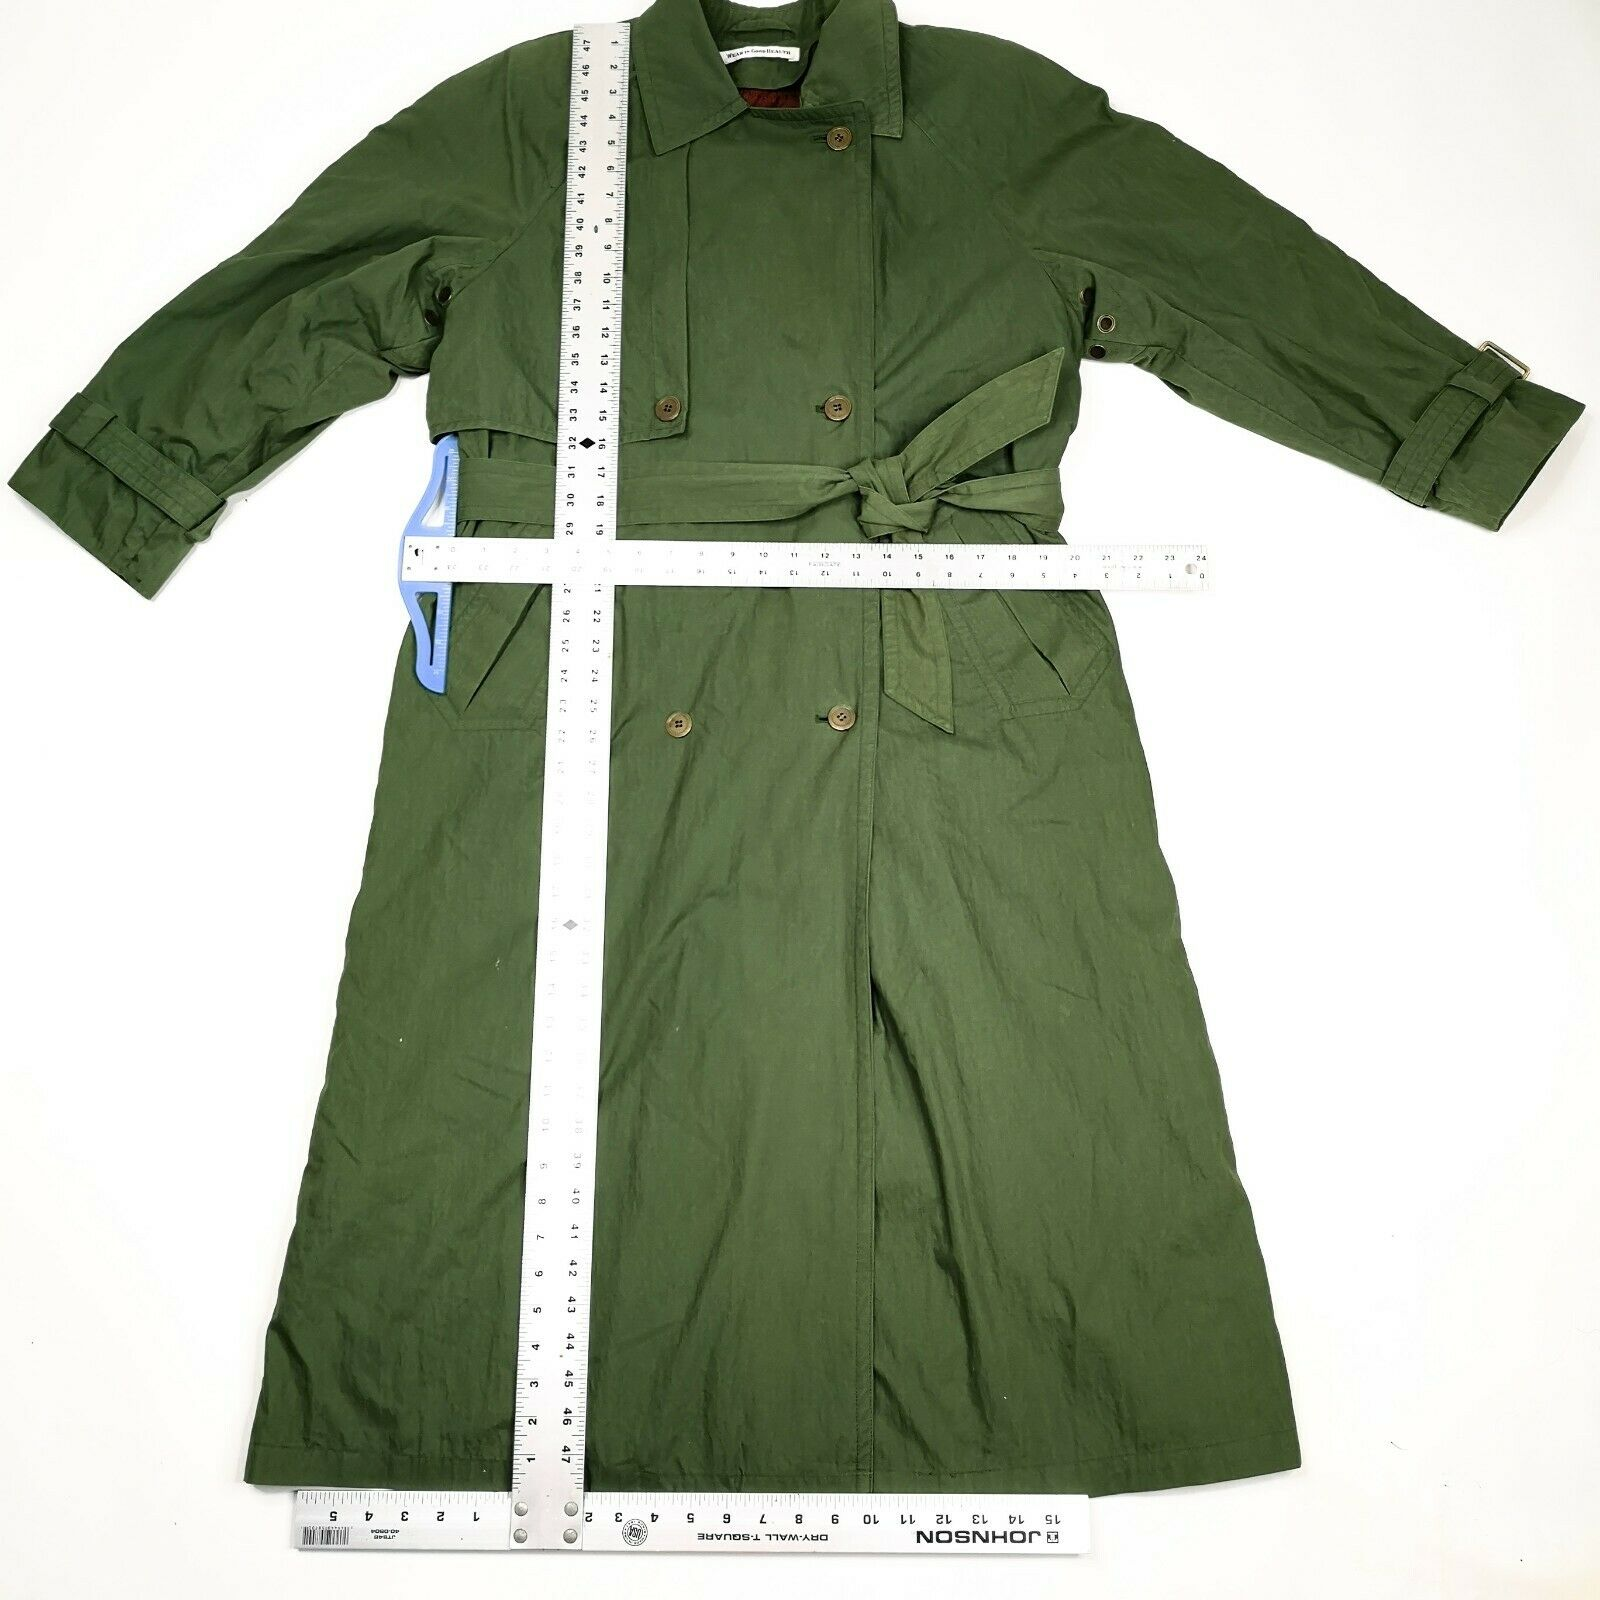 MISTY HARBOR Trench Coat Jacket 8 Olive Green - image 5